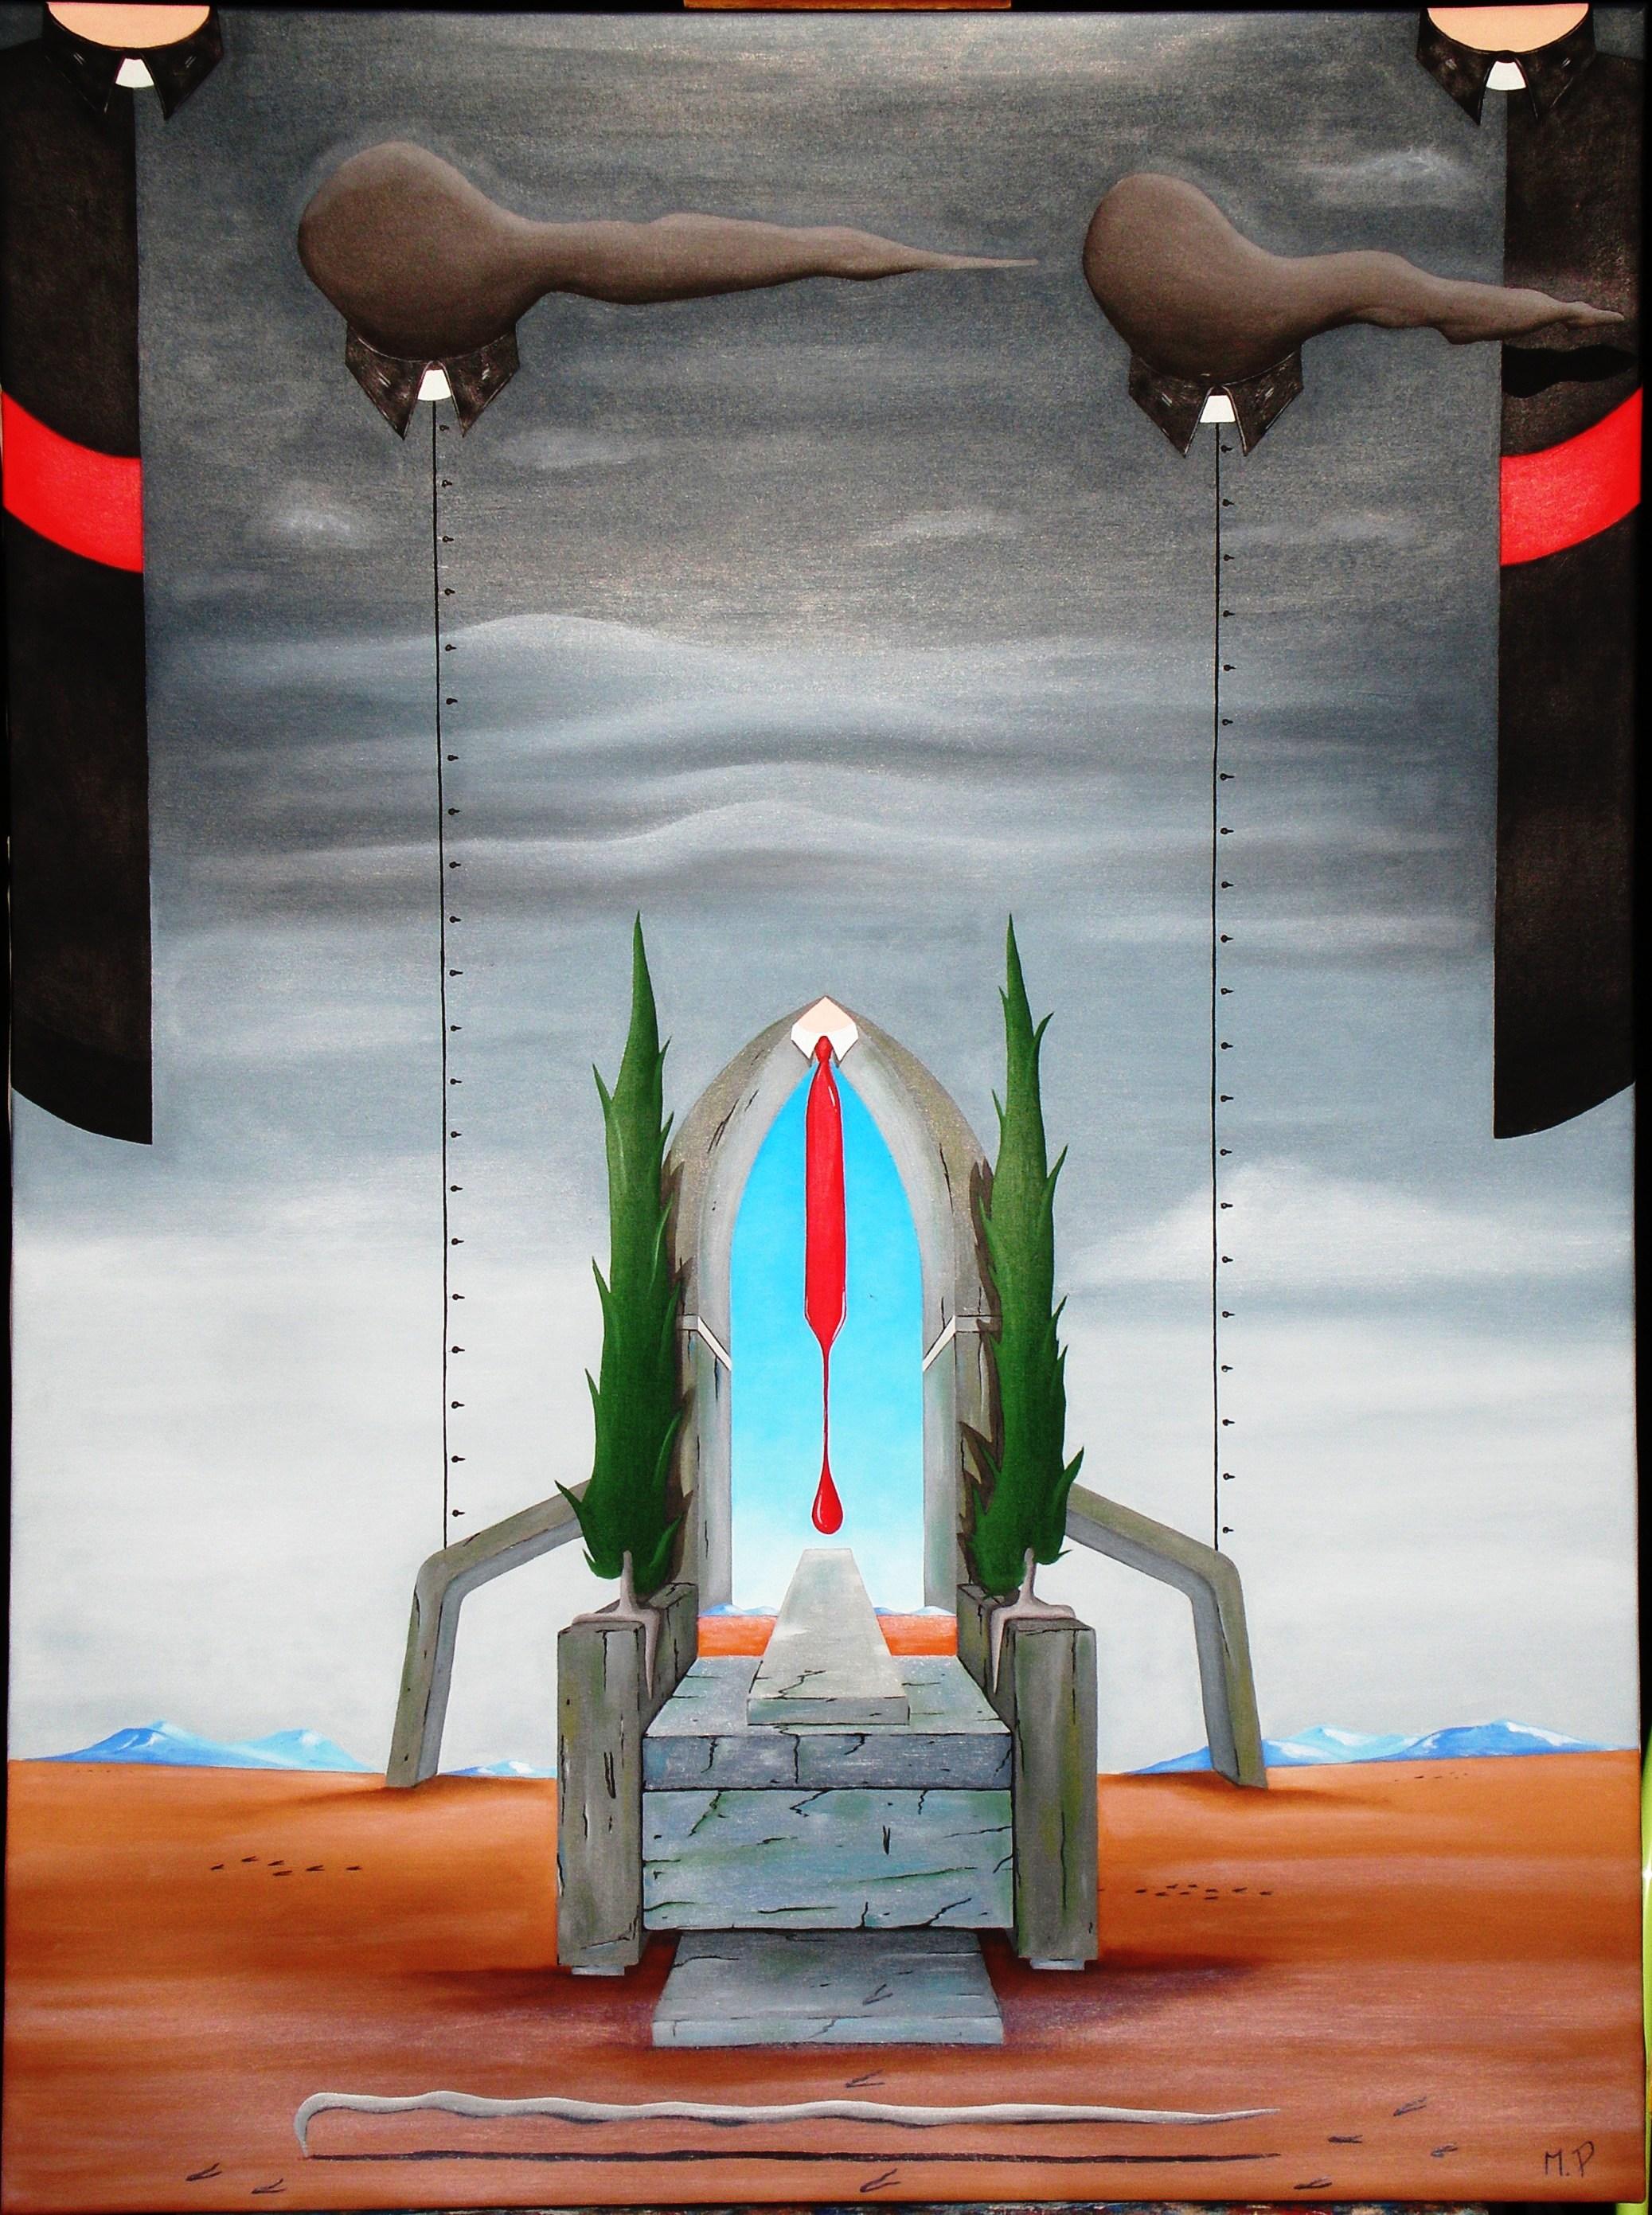 I poteri, 2013 olio su tela cm 60x80, The powers, oil on canvas, Pasquale Mastrogiacomo, Acerno (SA).